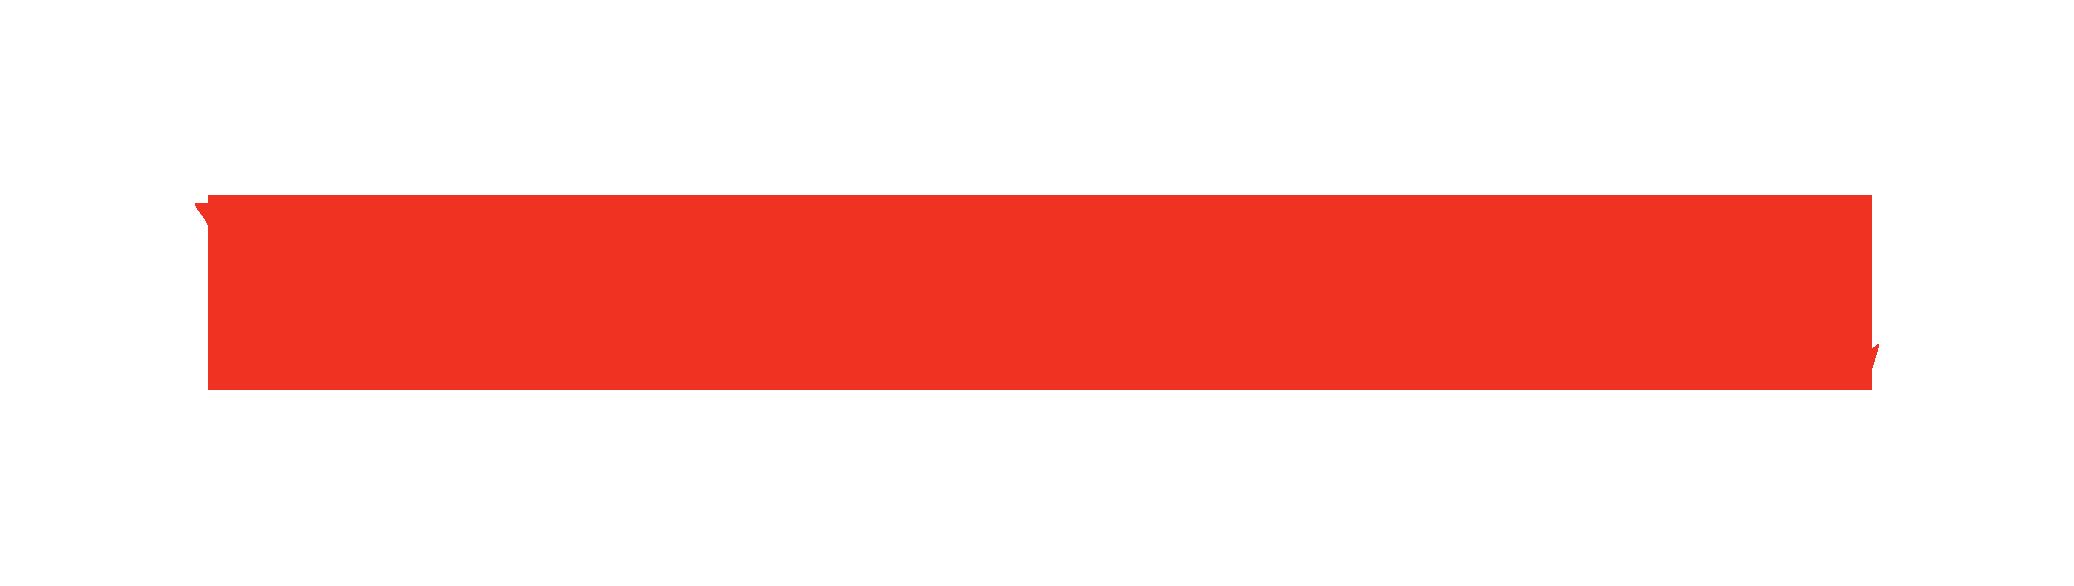 Viking Line Abp